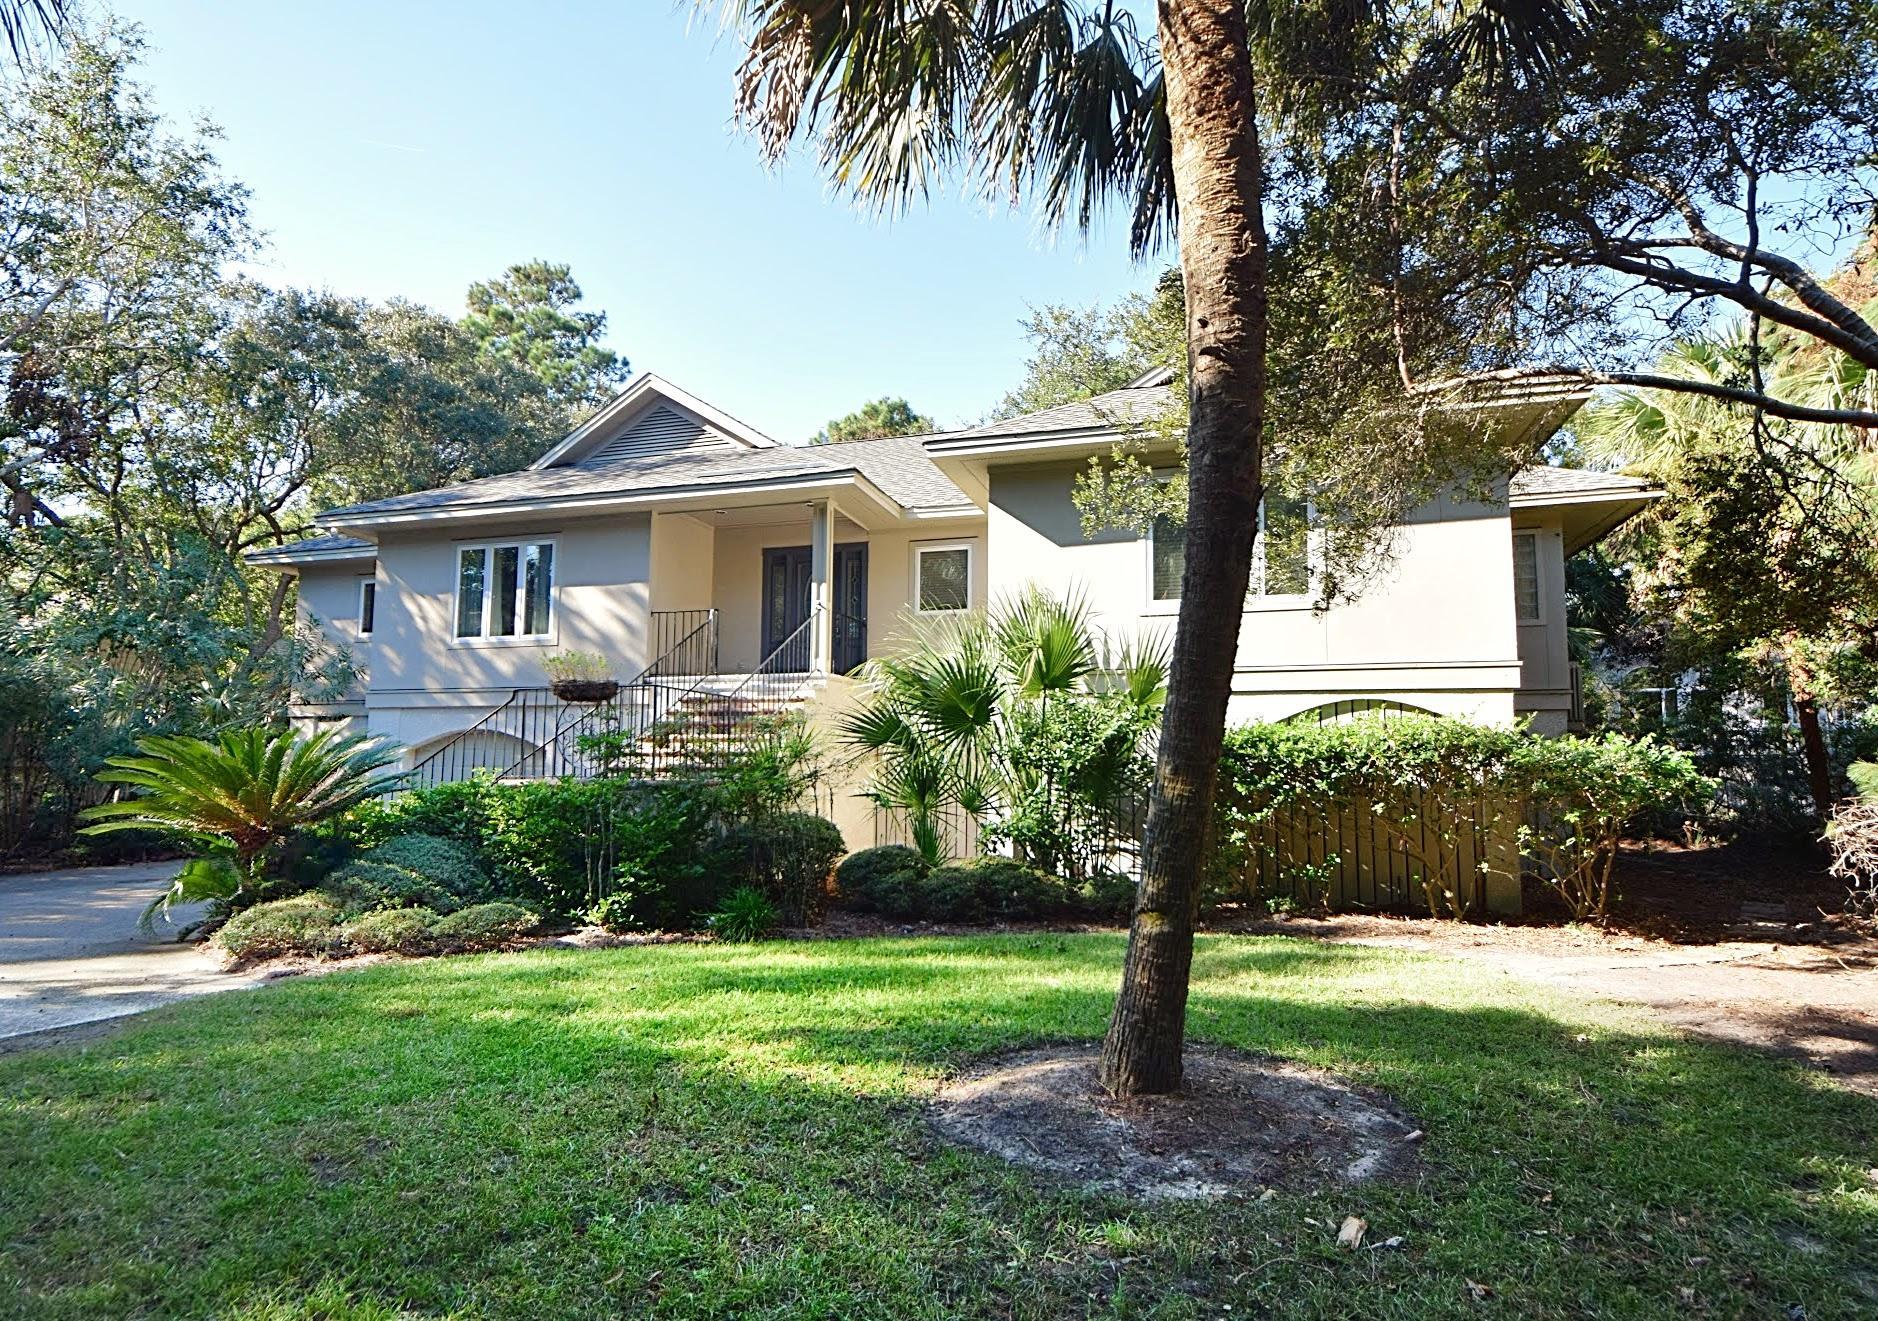 Kiawah Island Homes For Sale - 132 Governors, Kiawah Island, SC - 6